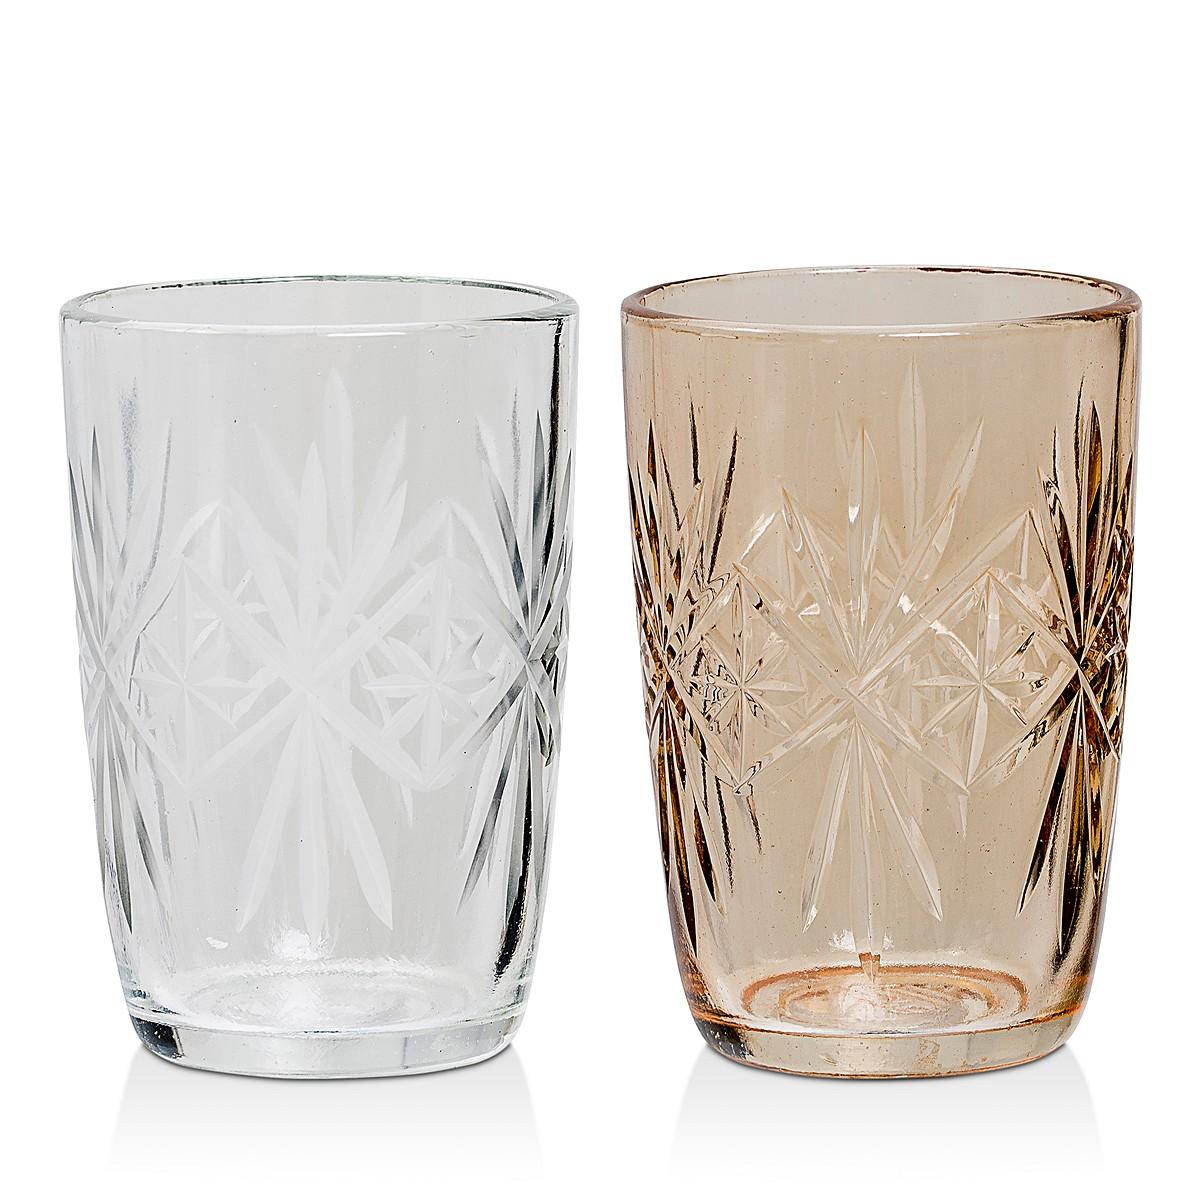 Etched Glass Votives  8 Available / $4 ea.